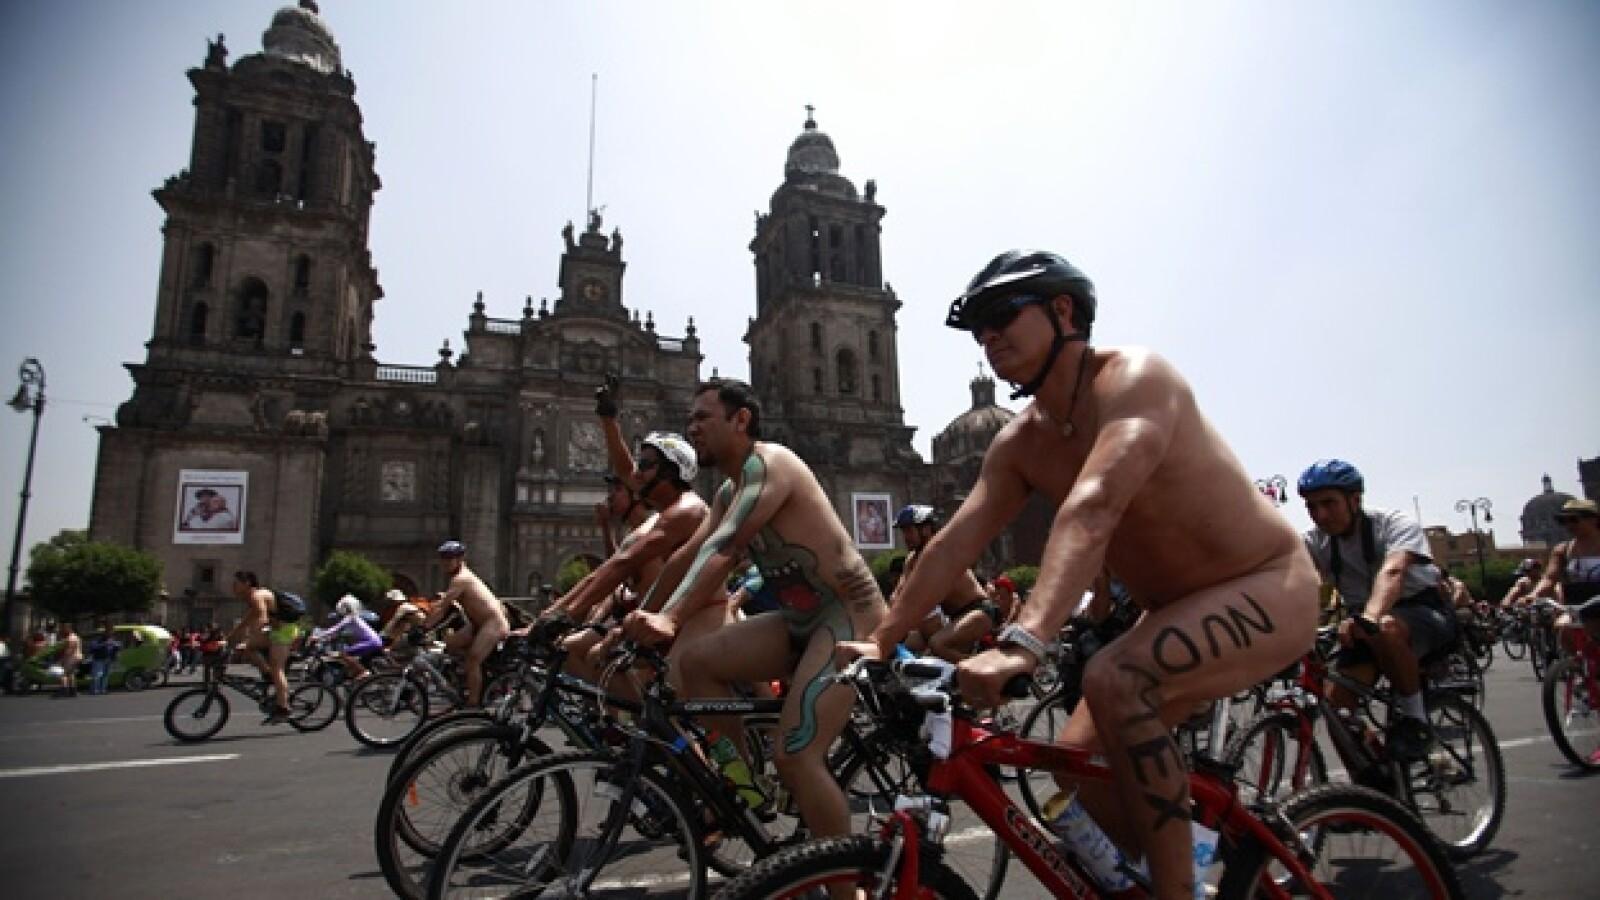 ciclistas desnudos frente a la catedral